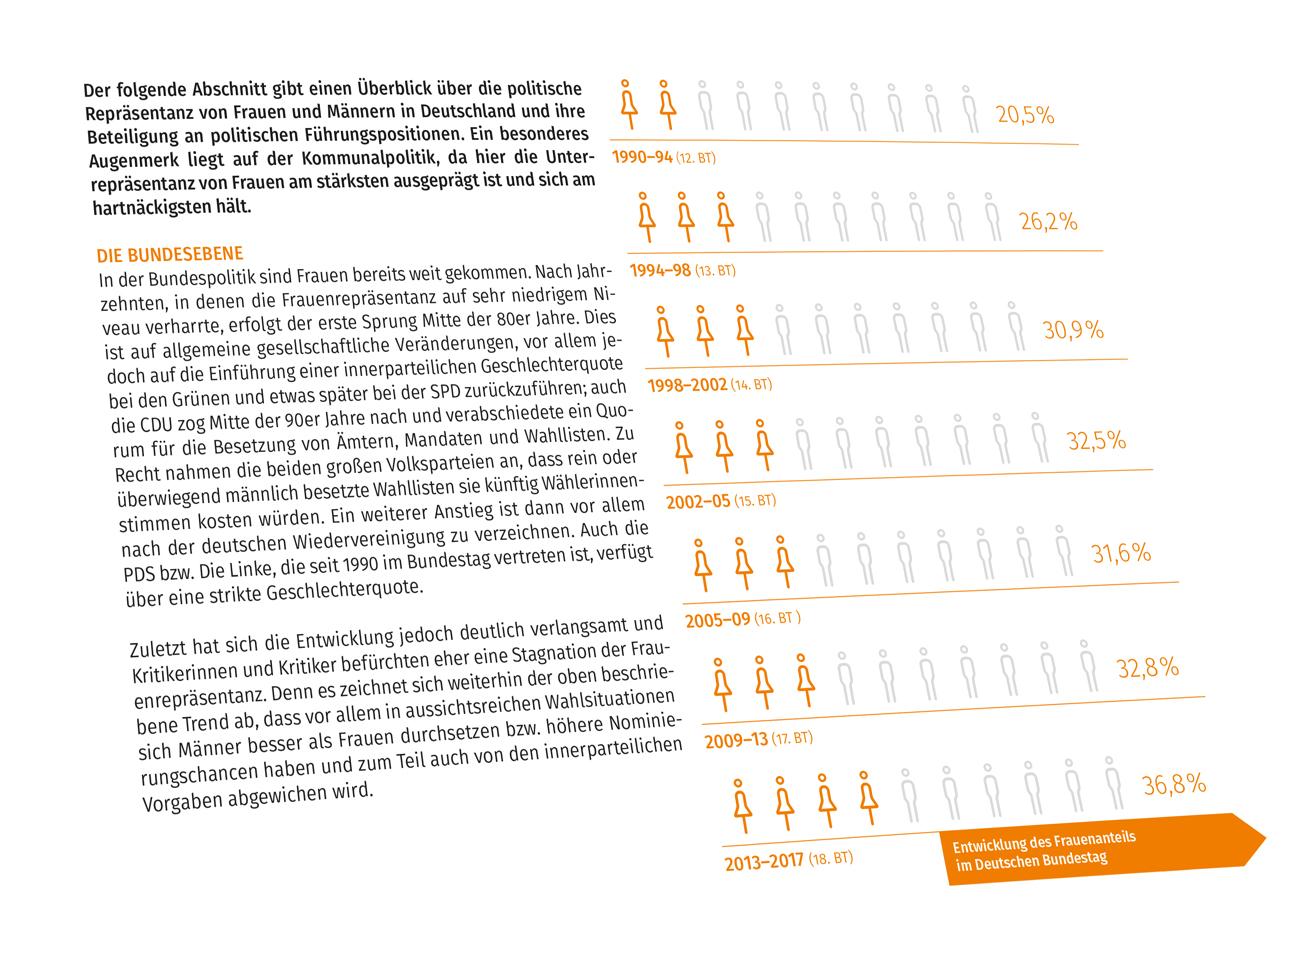 martin_zech_design_projekt-design_paritaet-in-der-politik_wegweiser_grafik